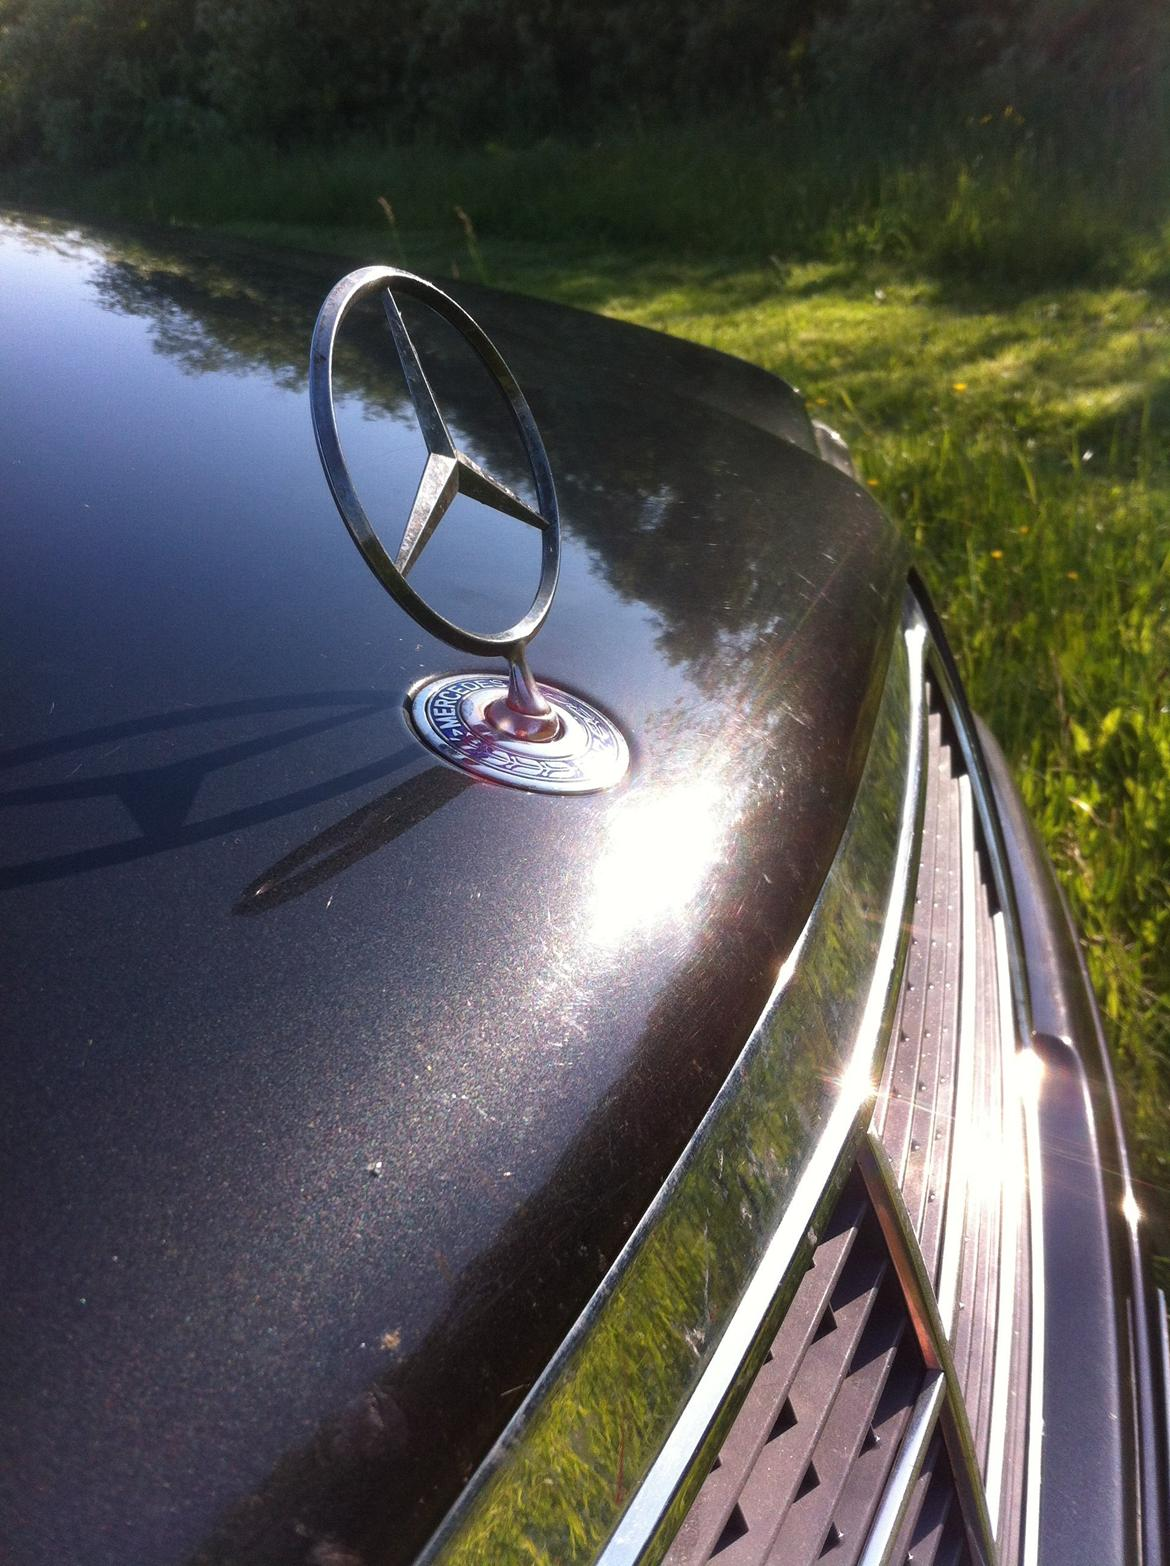 Mercedes Benz C180 billede 11